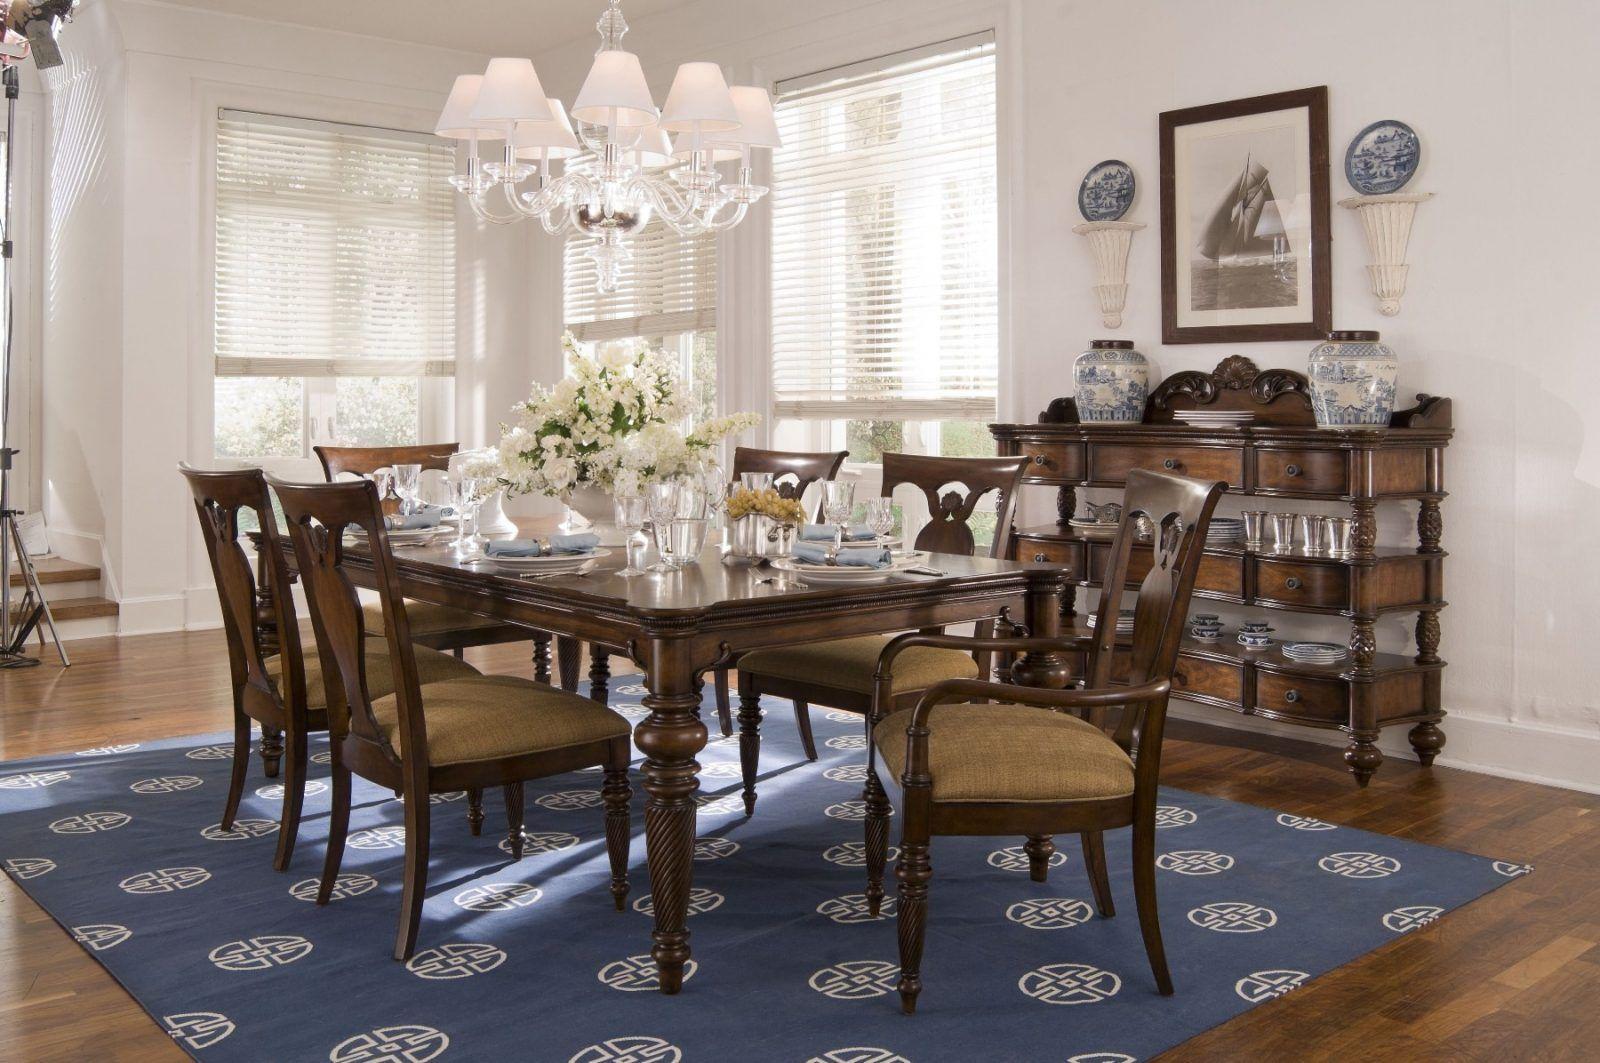 Sala decorada com estilo ingl s etnias decora o - Estilo ingles decoracion interiores ...